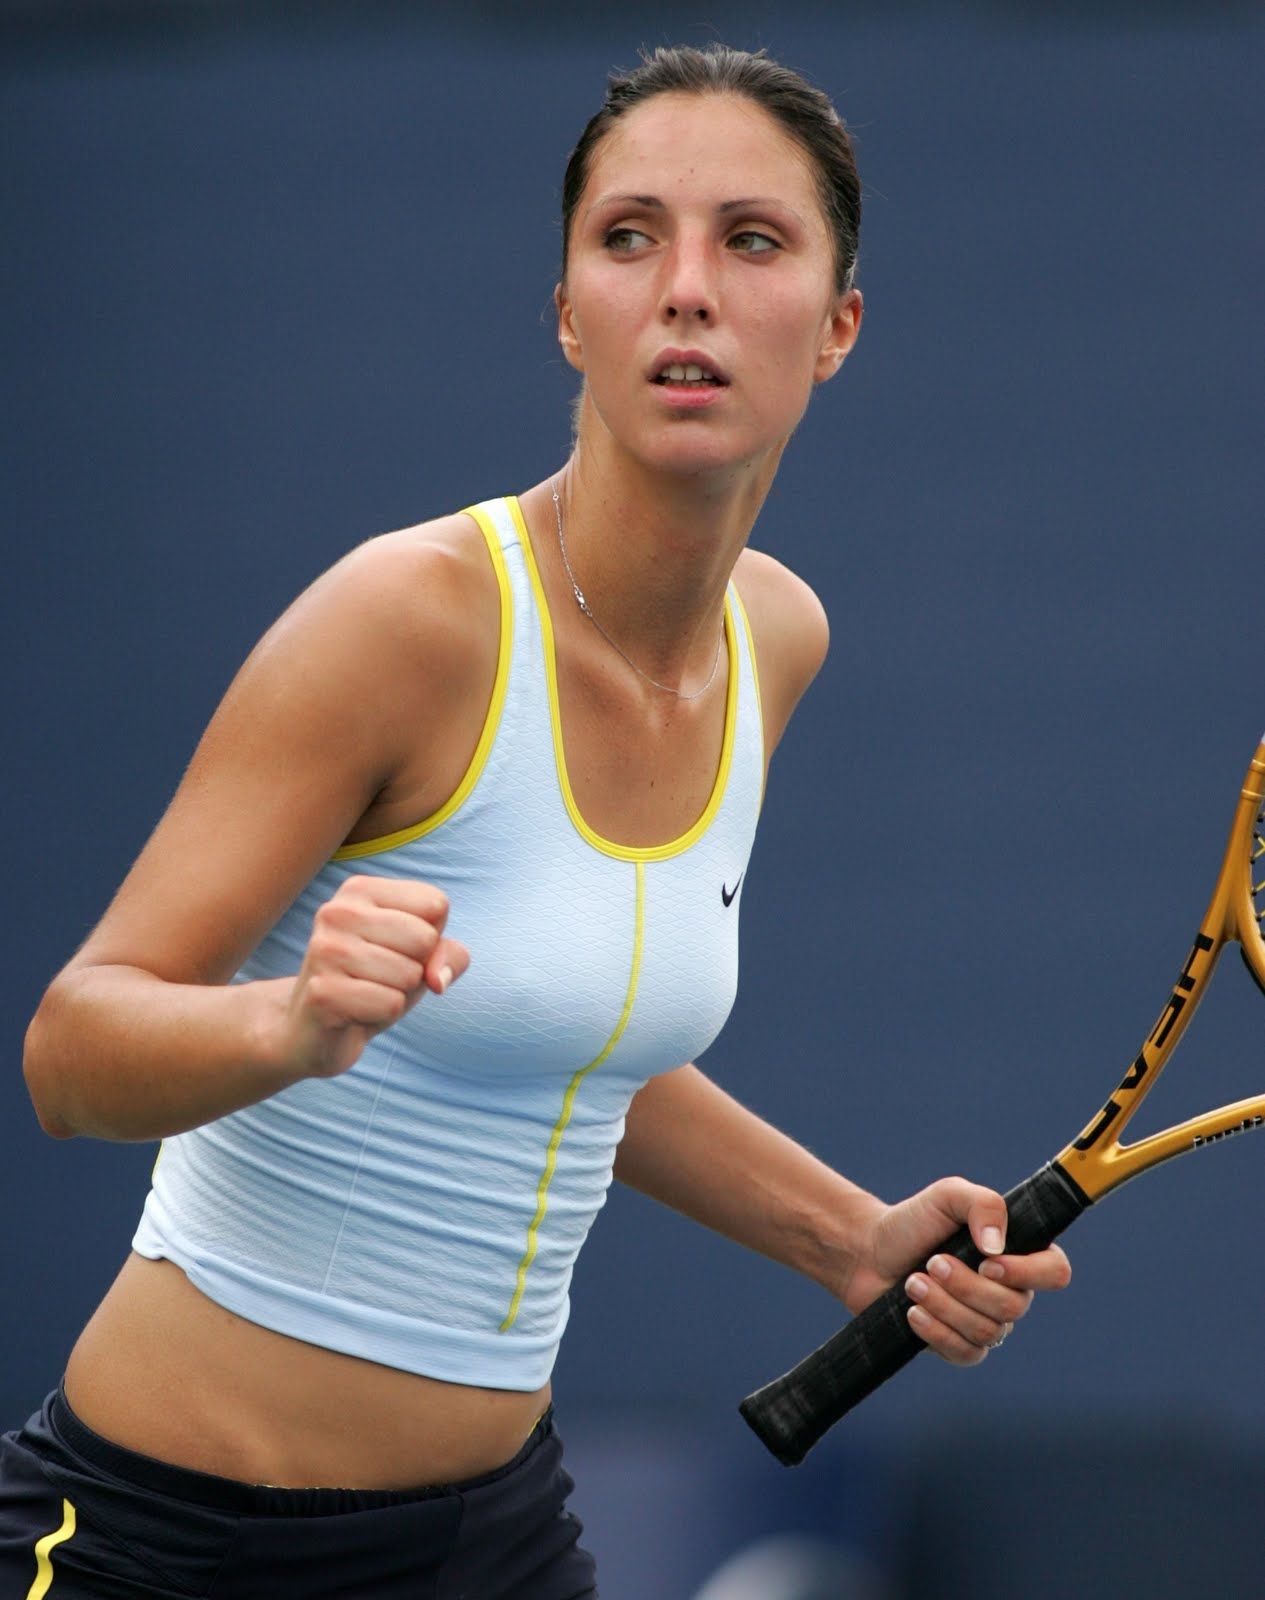 Tennis players female hot